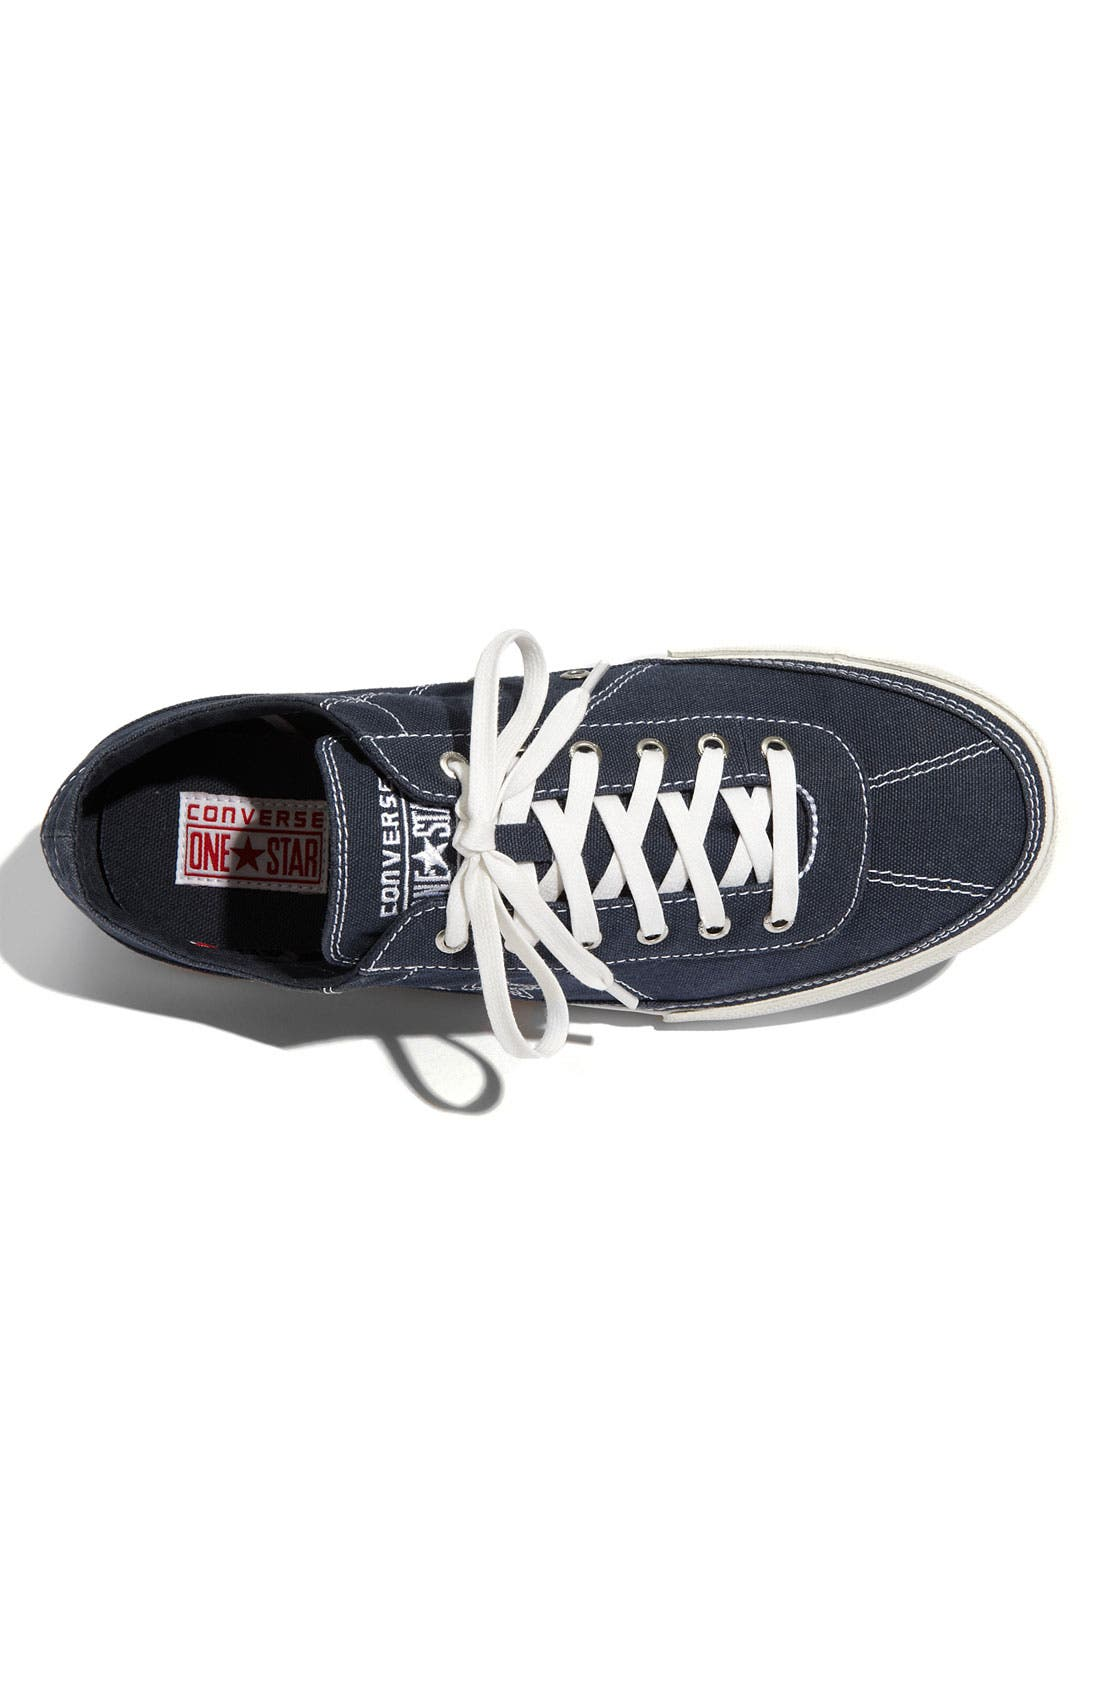 Alternate Image 3  - Converse 'One Star Baseline' Sneaker